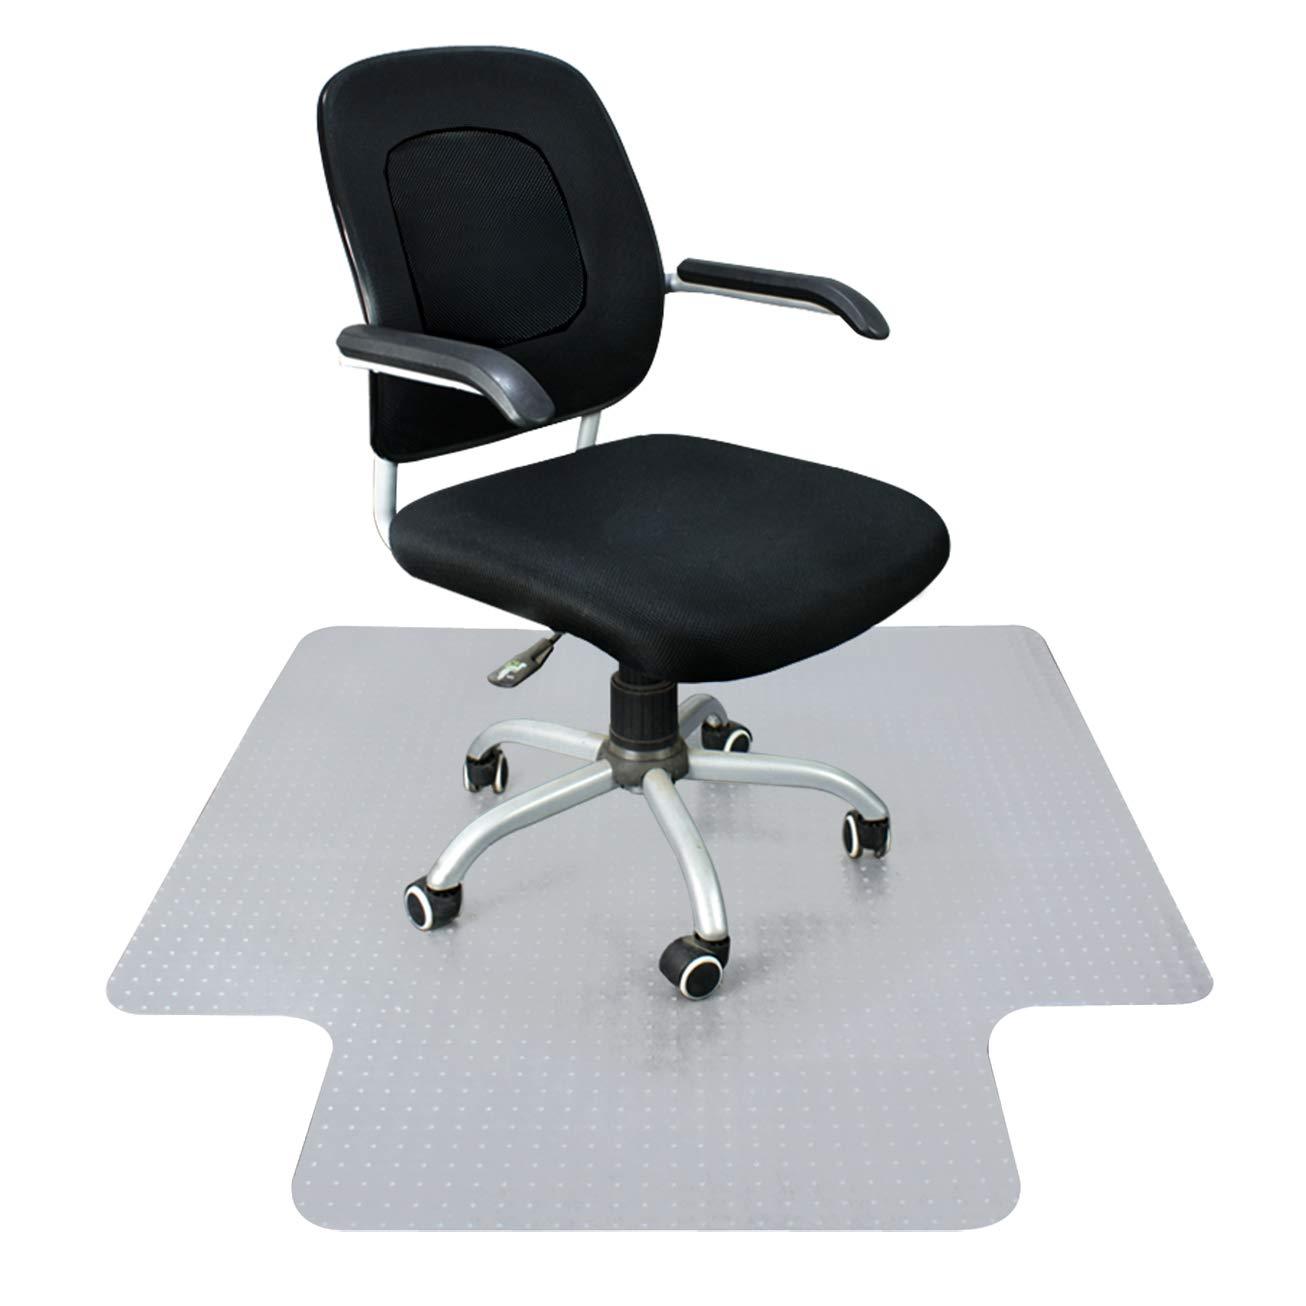 "Super Deal Upgraded 48"" X 36""/ 60'' X 48'' - 1/8"" Heavy Duty Carpet Chair Mat w/Lip, Transparent Chair mat for Office Chair Rug Carpet Floor Computer Desk Low and Medium Pile Carpets (#2) (4836'')"